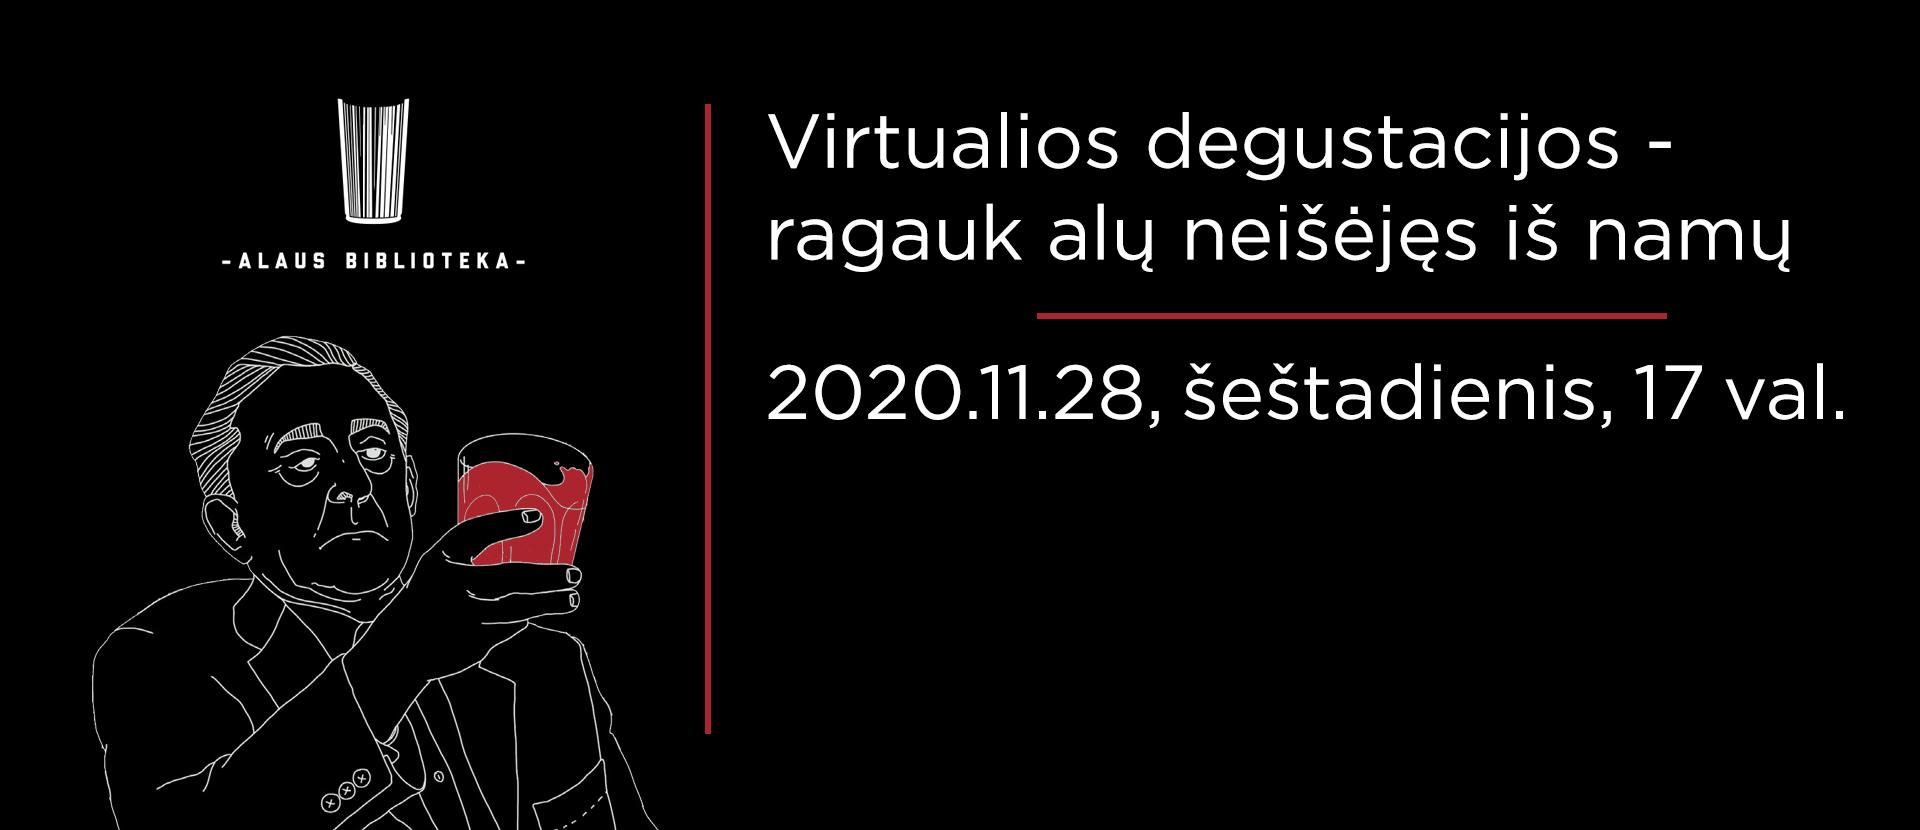 Live: virtuali Alaus Bibliotekos degustacija